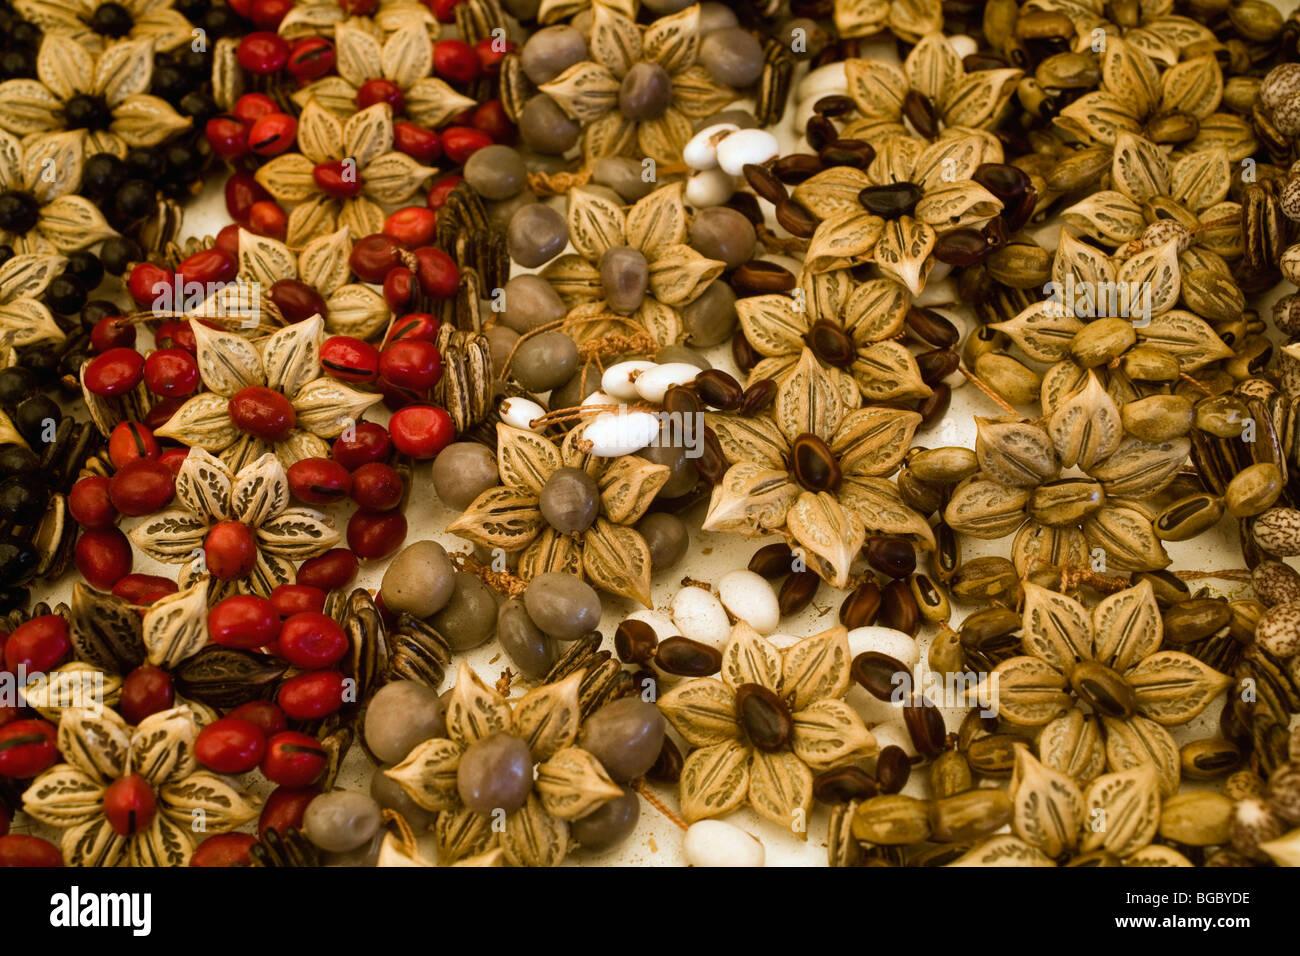 Caribbean souvenirs, Cuba - Stock Image